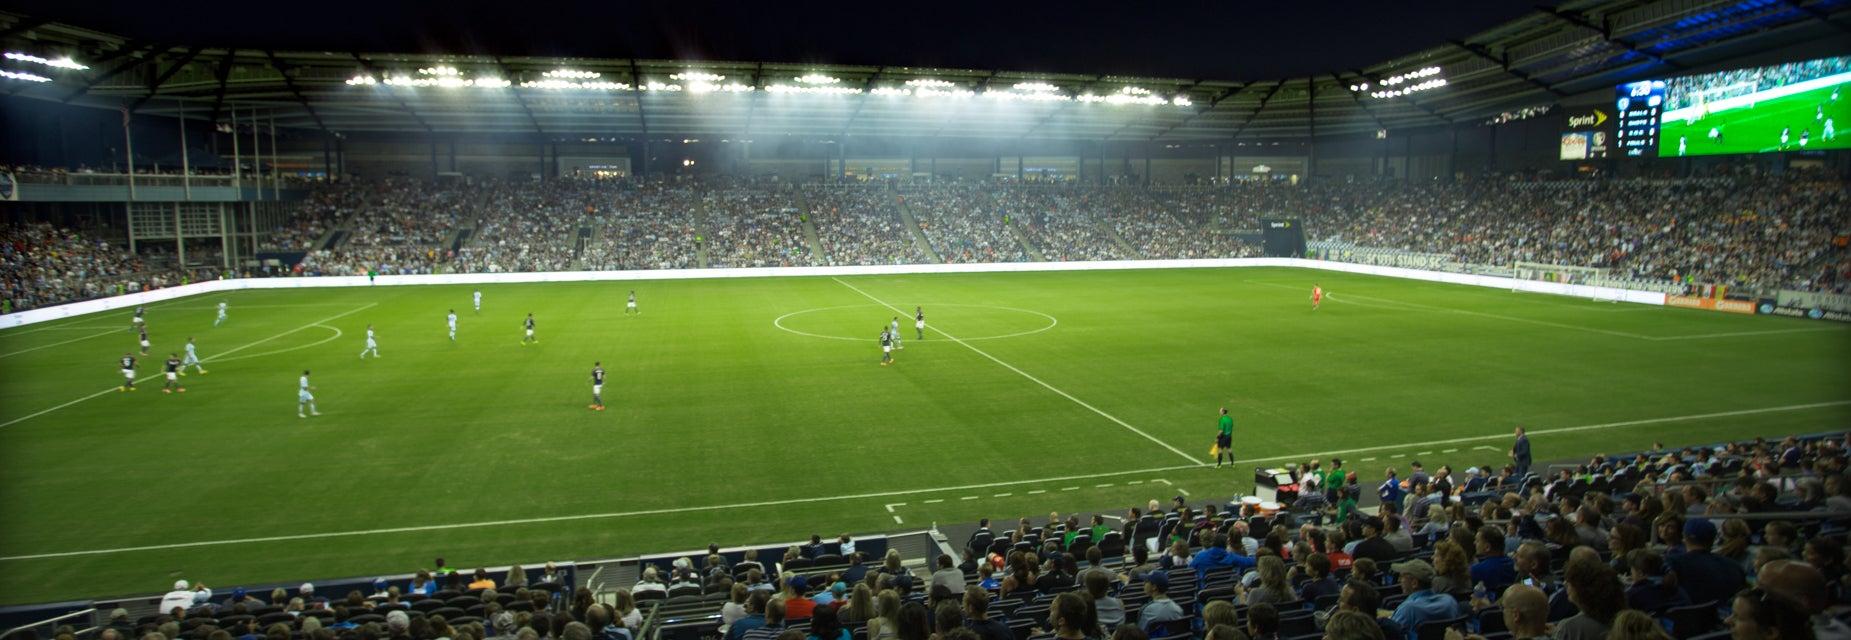 Seat view from Stadium Club